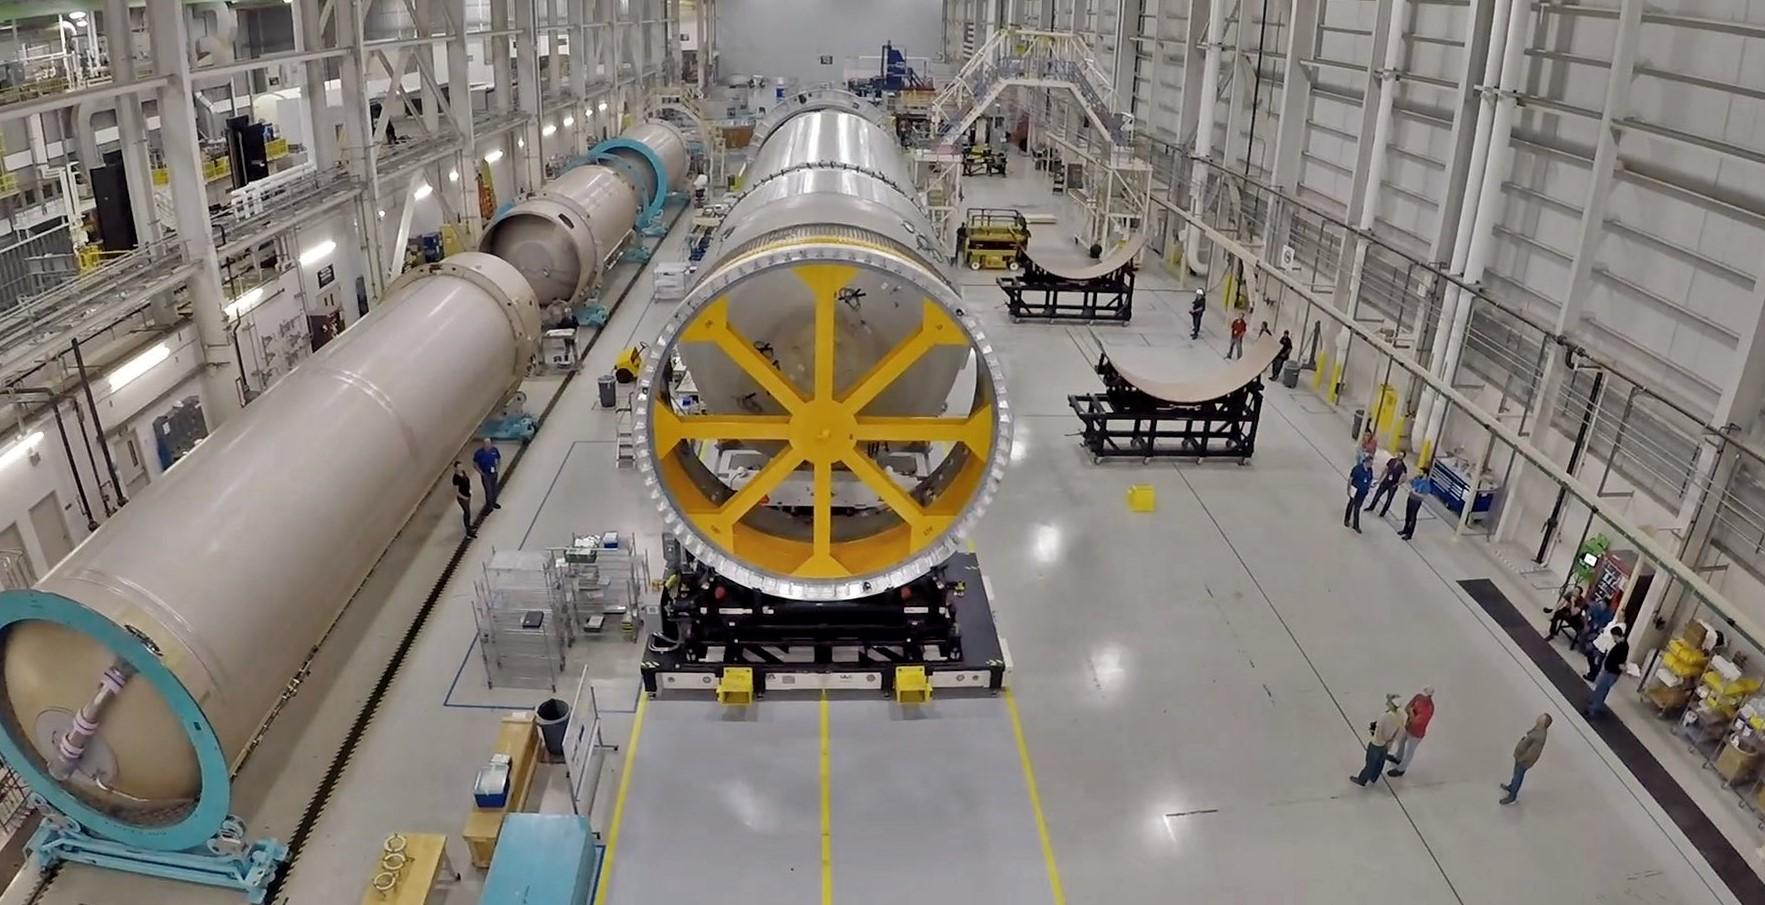 Vulcan structural qual booster 073119 (Tory Bruno) 2